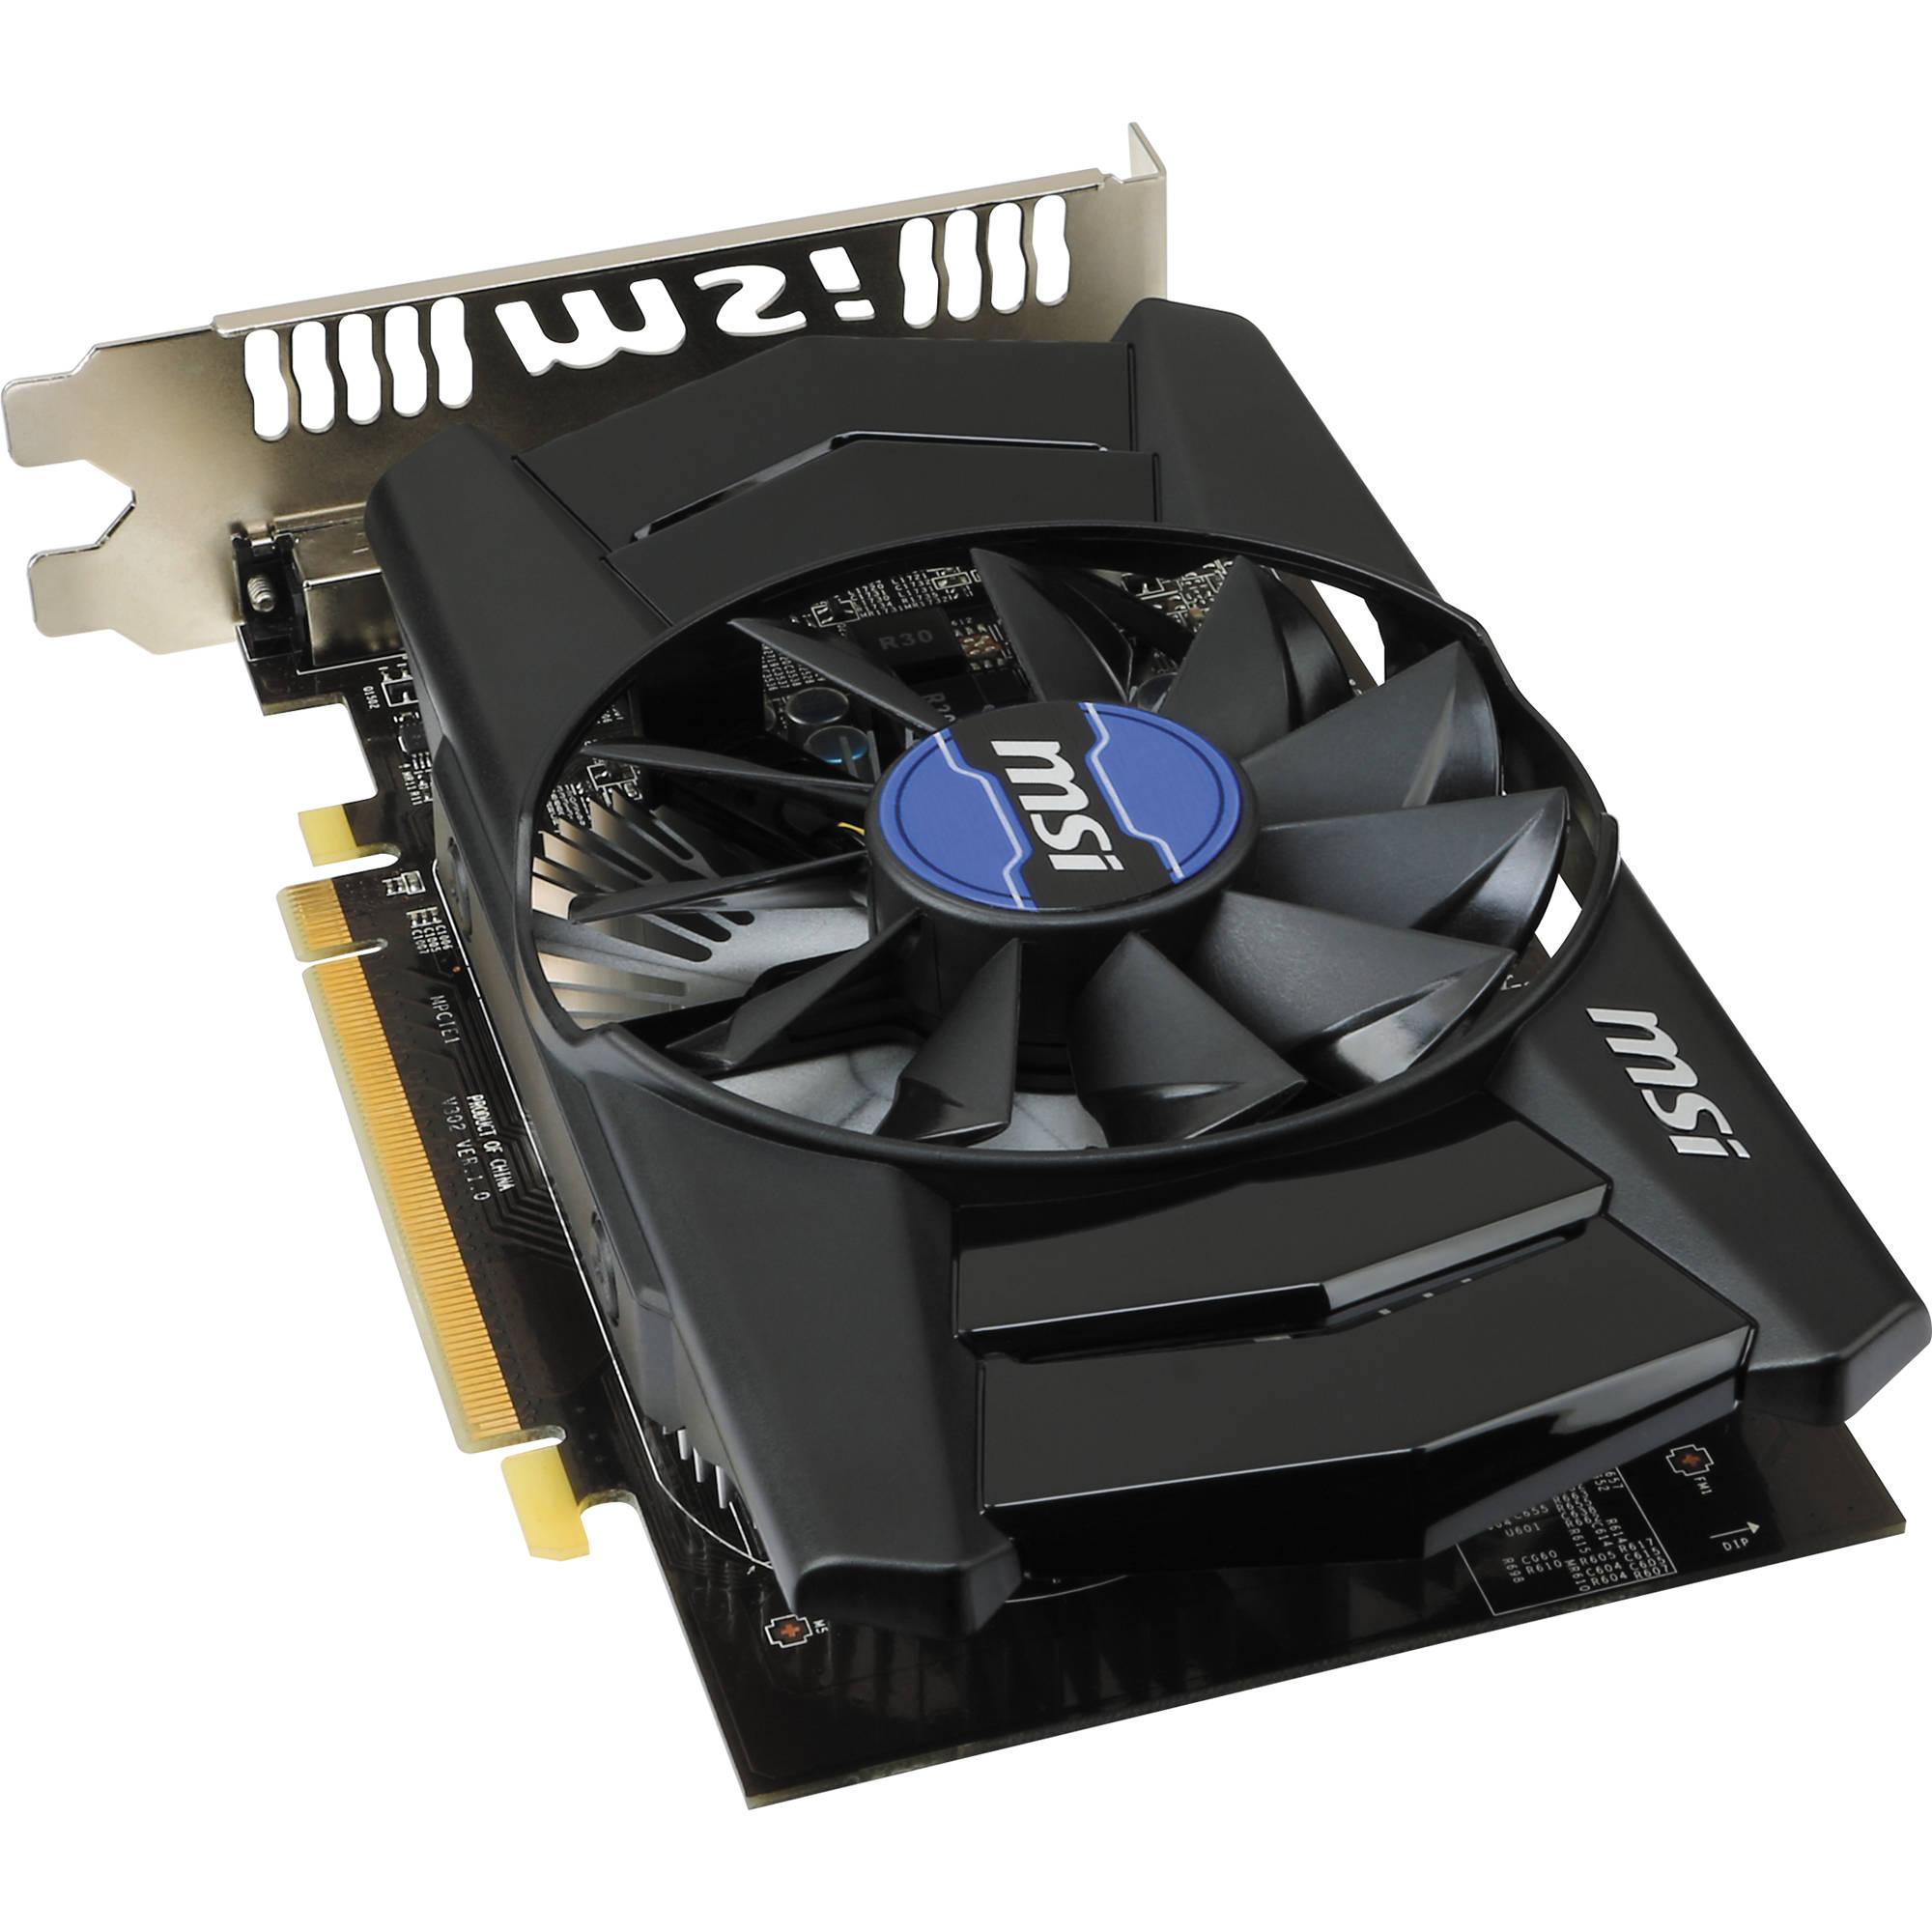 MSI Radeon R7 250 Graphics Card (2GB DDR3)